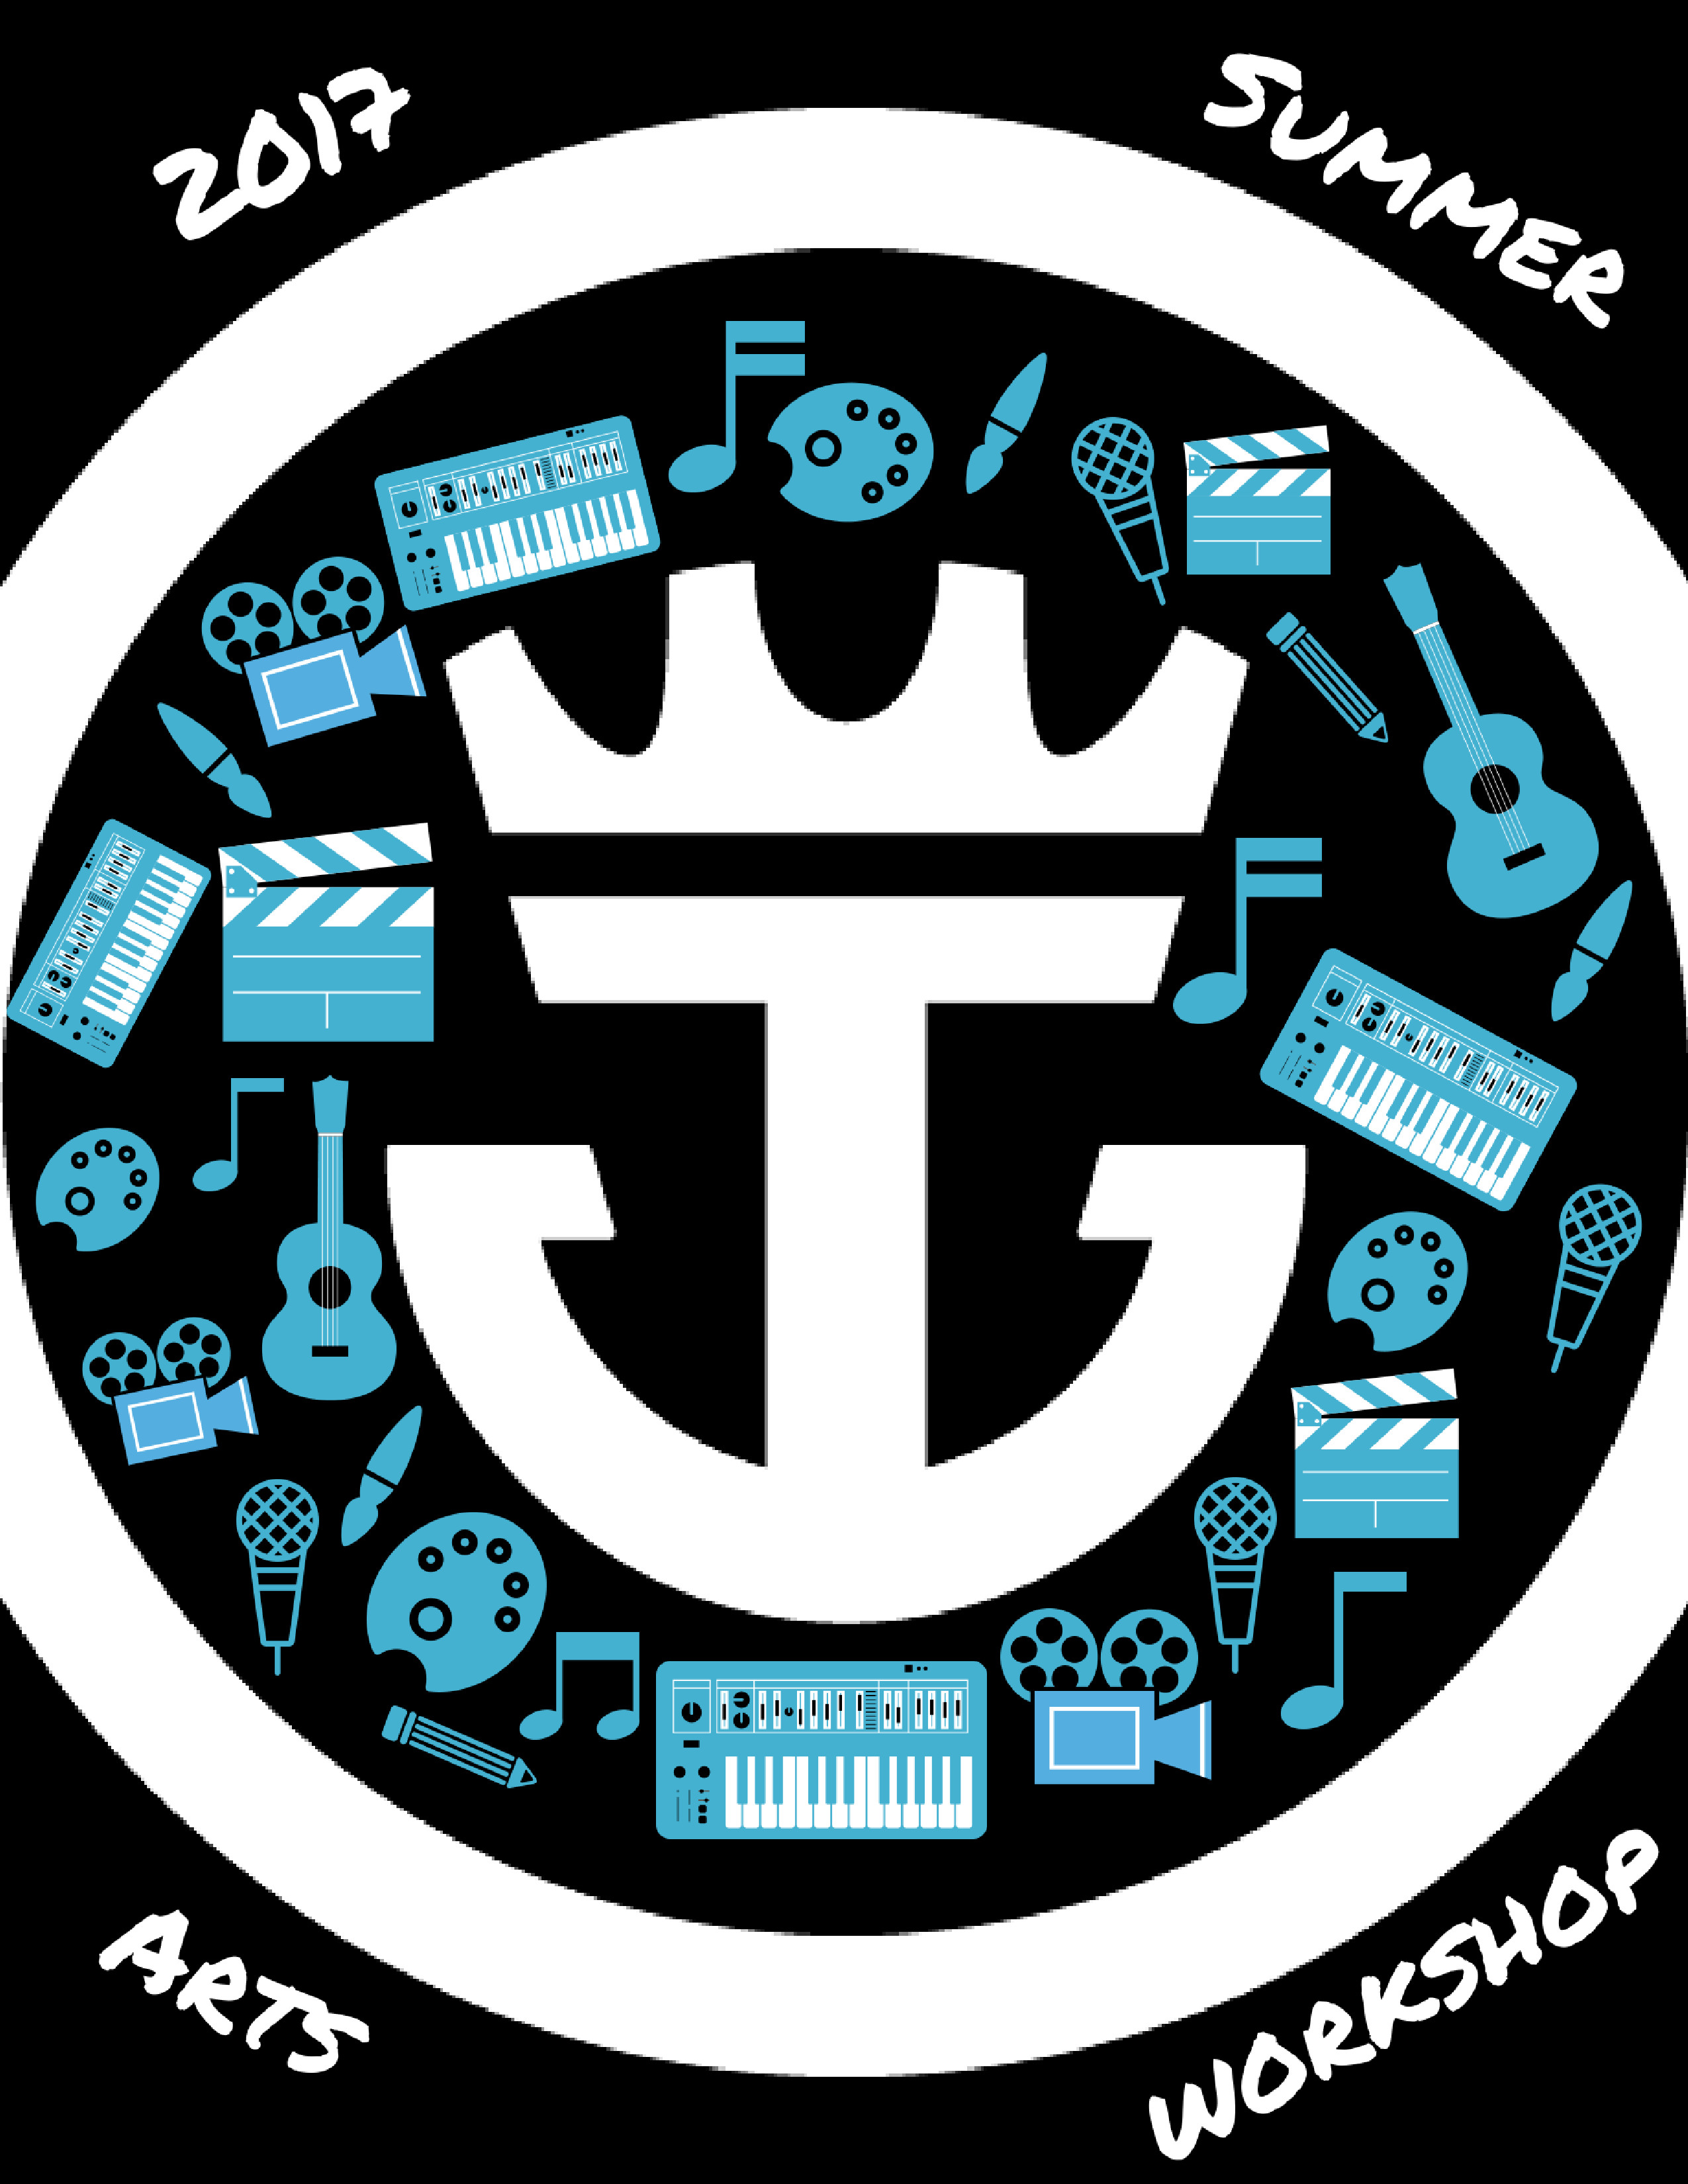 2017 summer arts workshop logo ideas ver2